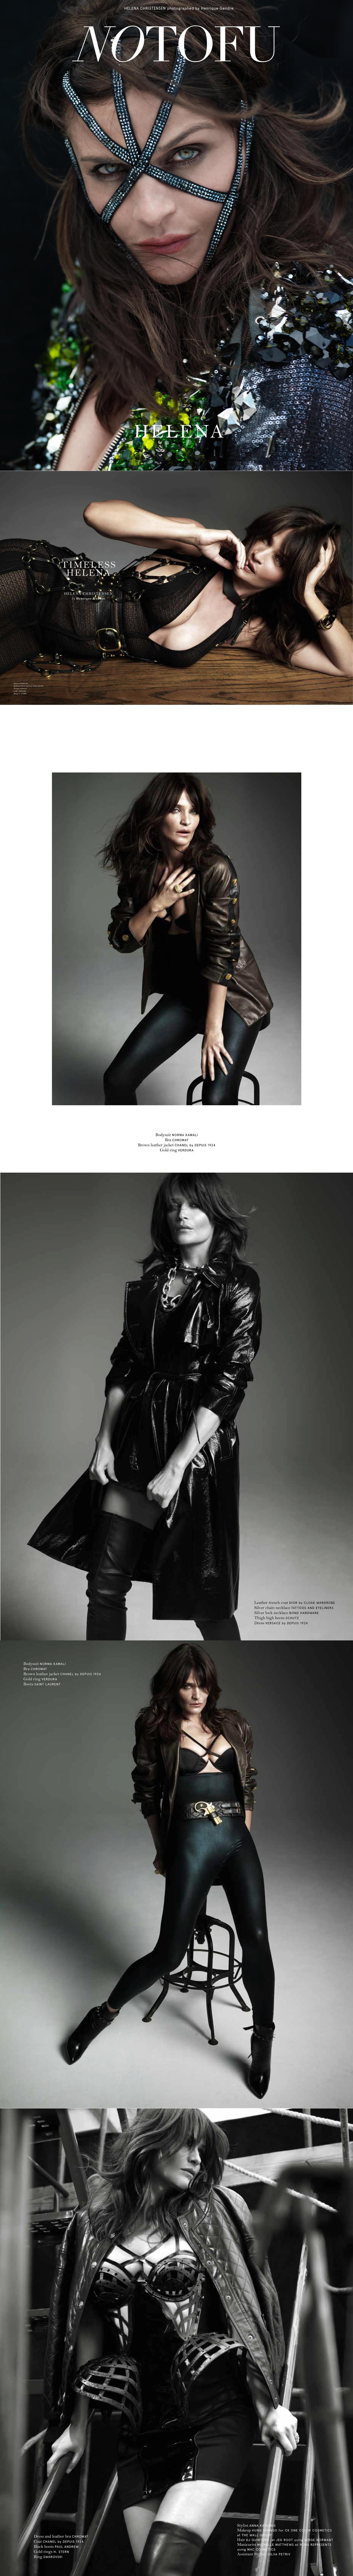 Helena Christensen wears  Depuis 1924 vintage Chanel